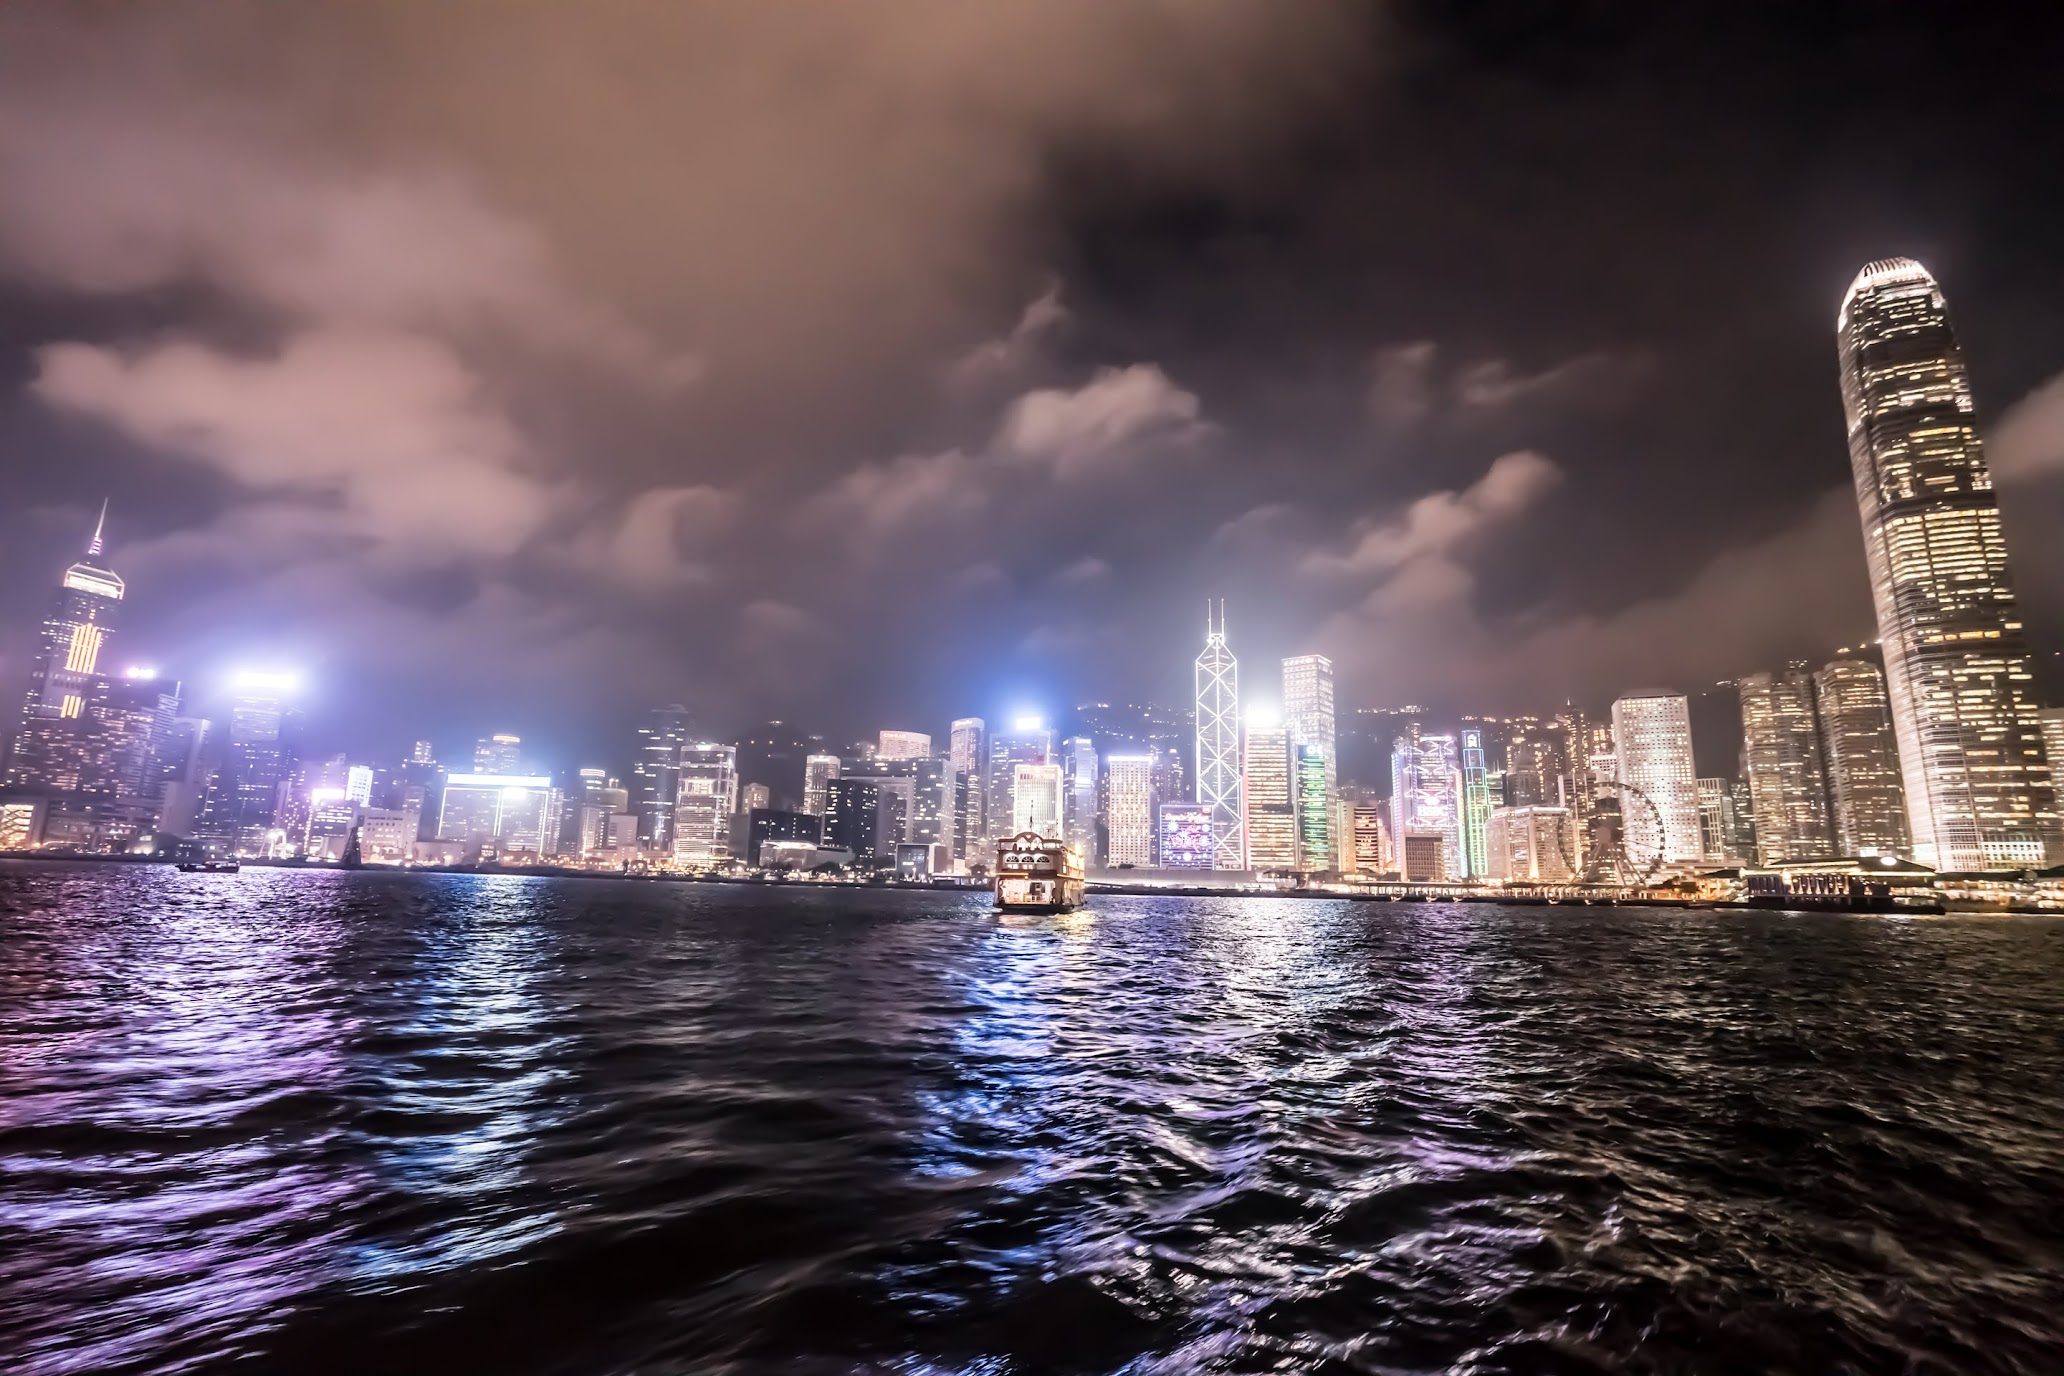 Hong Kong star ferry Night view2